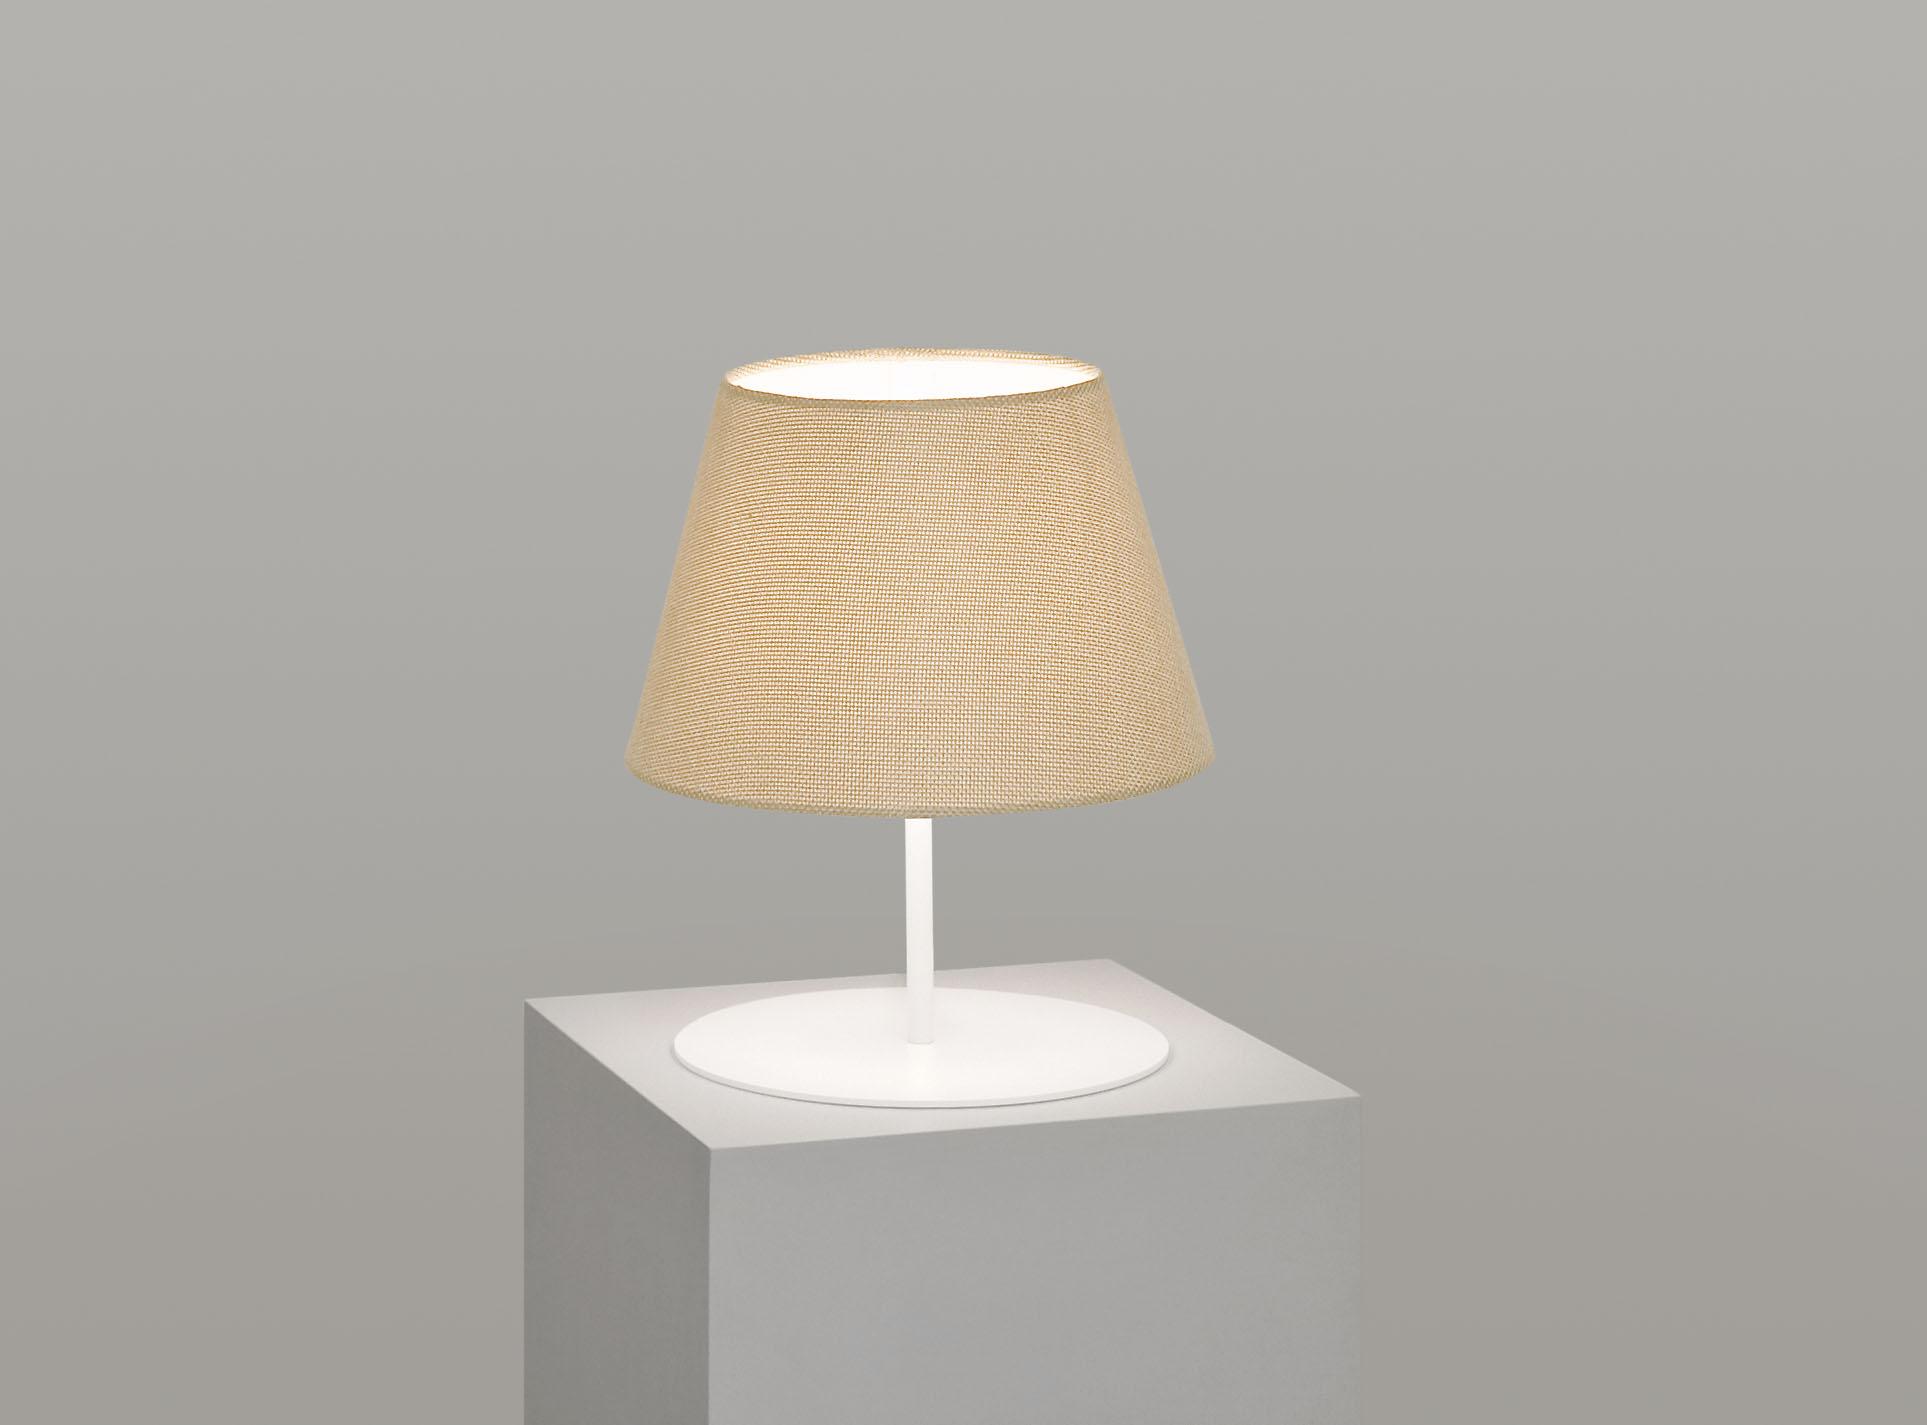 pegasus_lamp_white_base_hessian.jpg